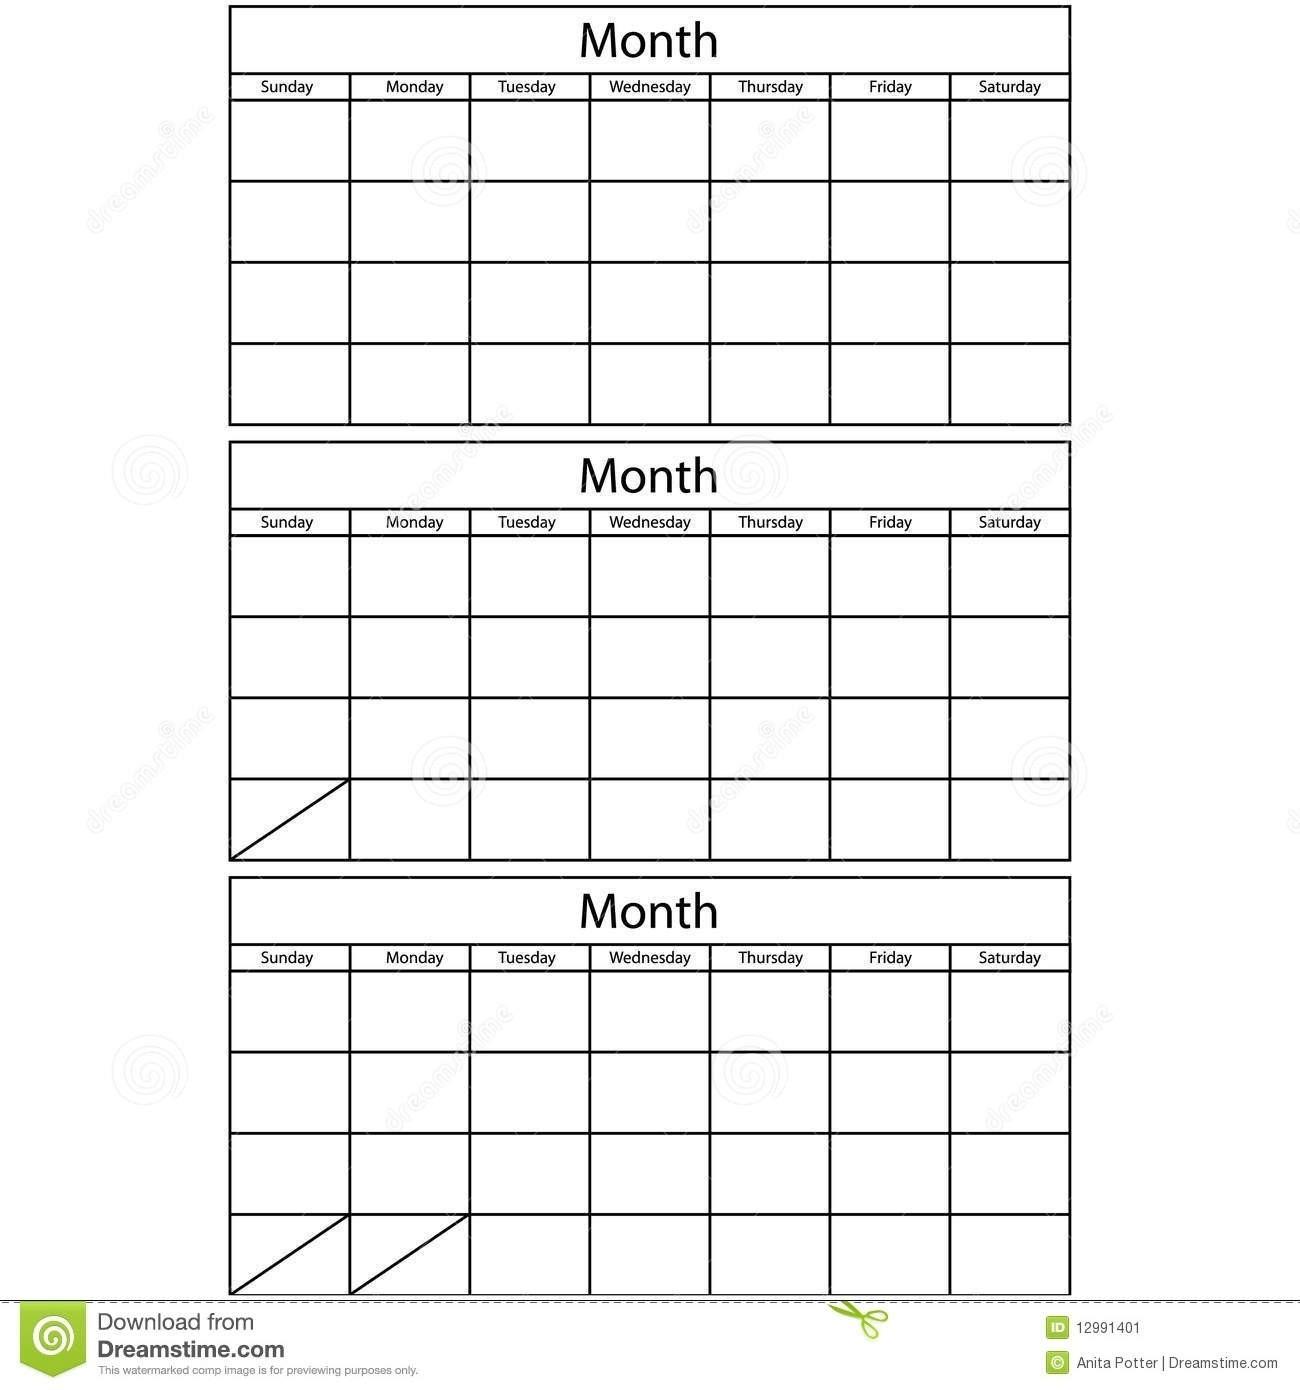 September Fill In Calendar 2021 | Calendar Template Printable  2021-19 Financial Year Dates